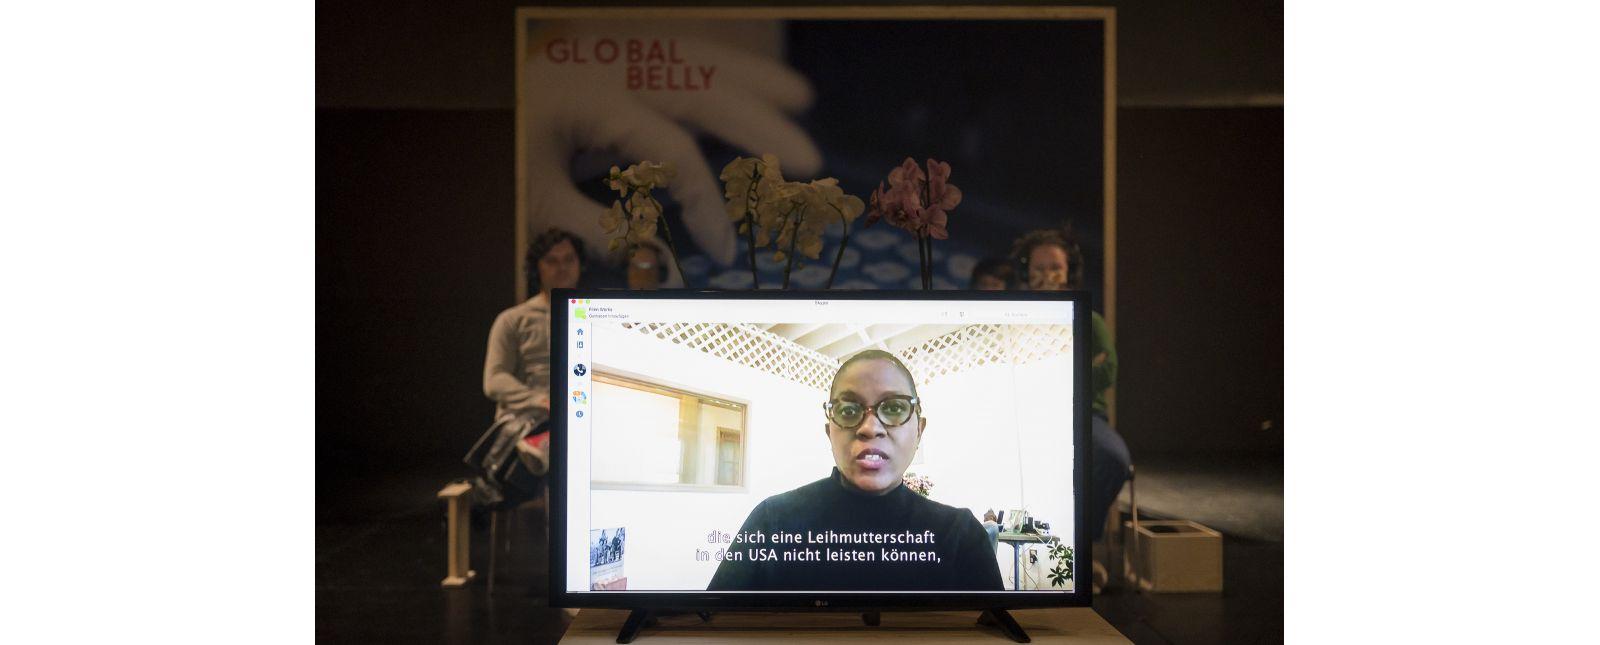 GLOBAL BELLY // Crystal Travis // 2020 // Marc Doradzillo